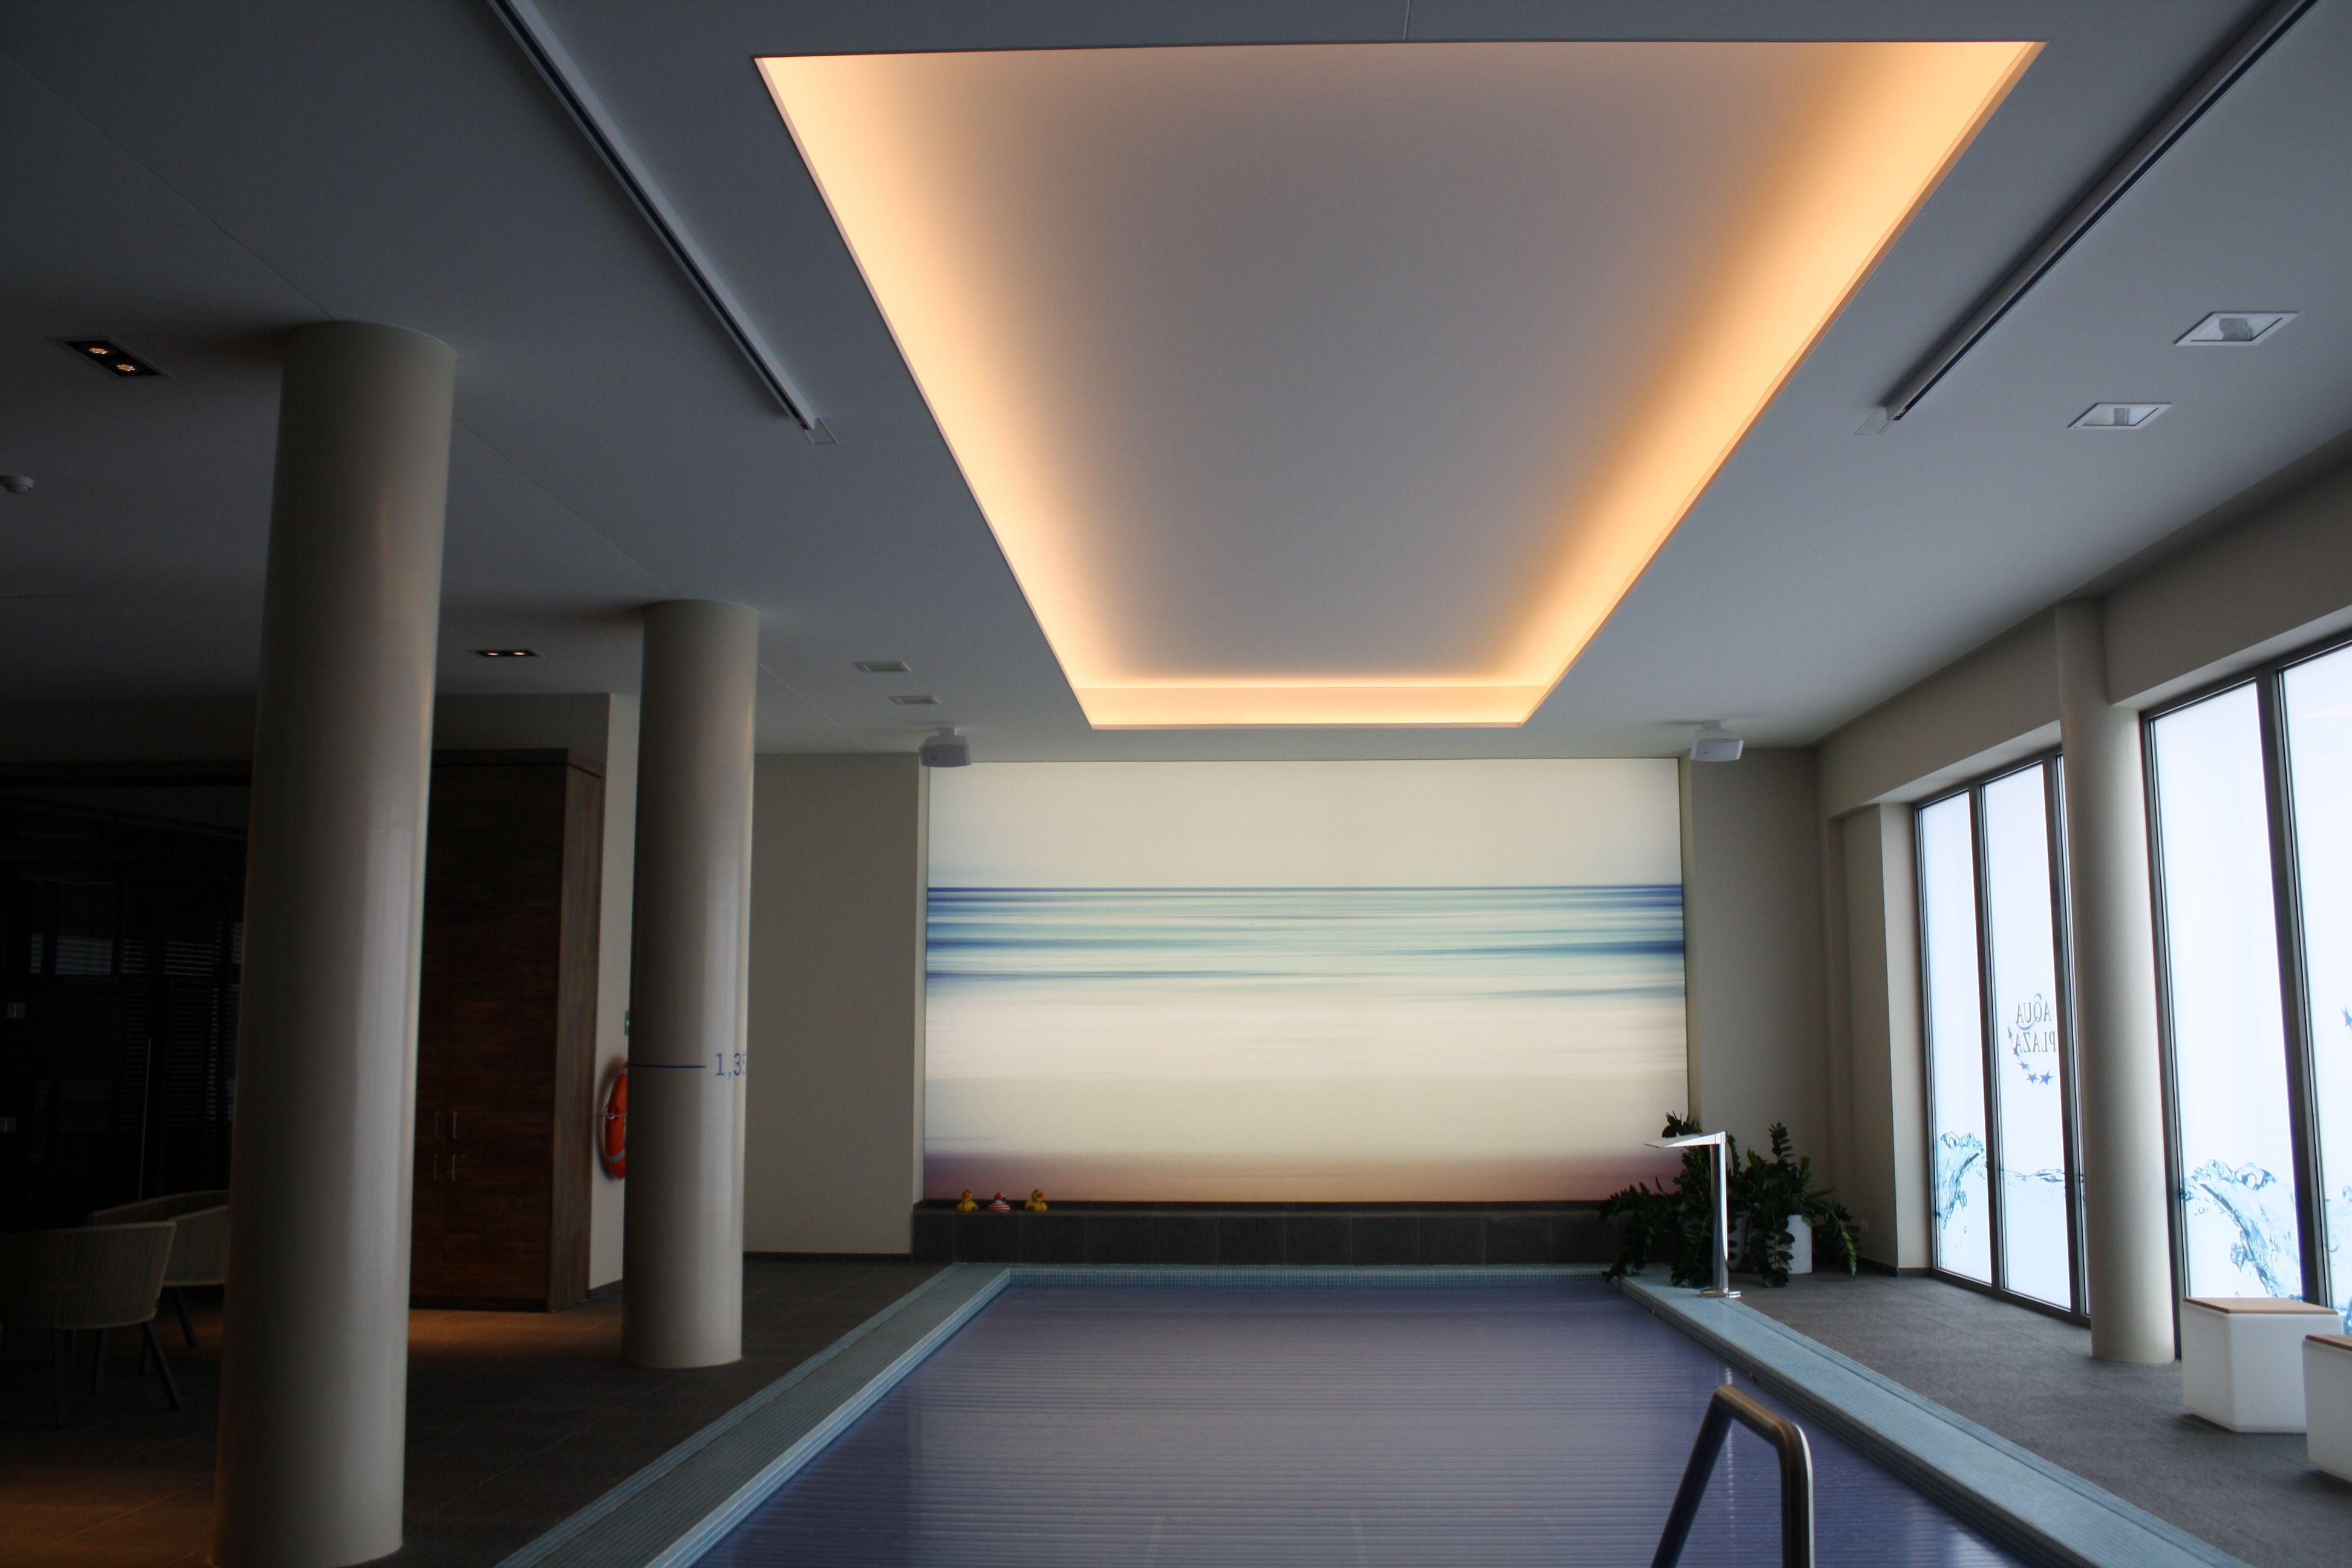 Blanco spanplafond met geintegreerde led-verlichting.   Spanplafonds ...